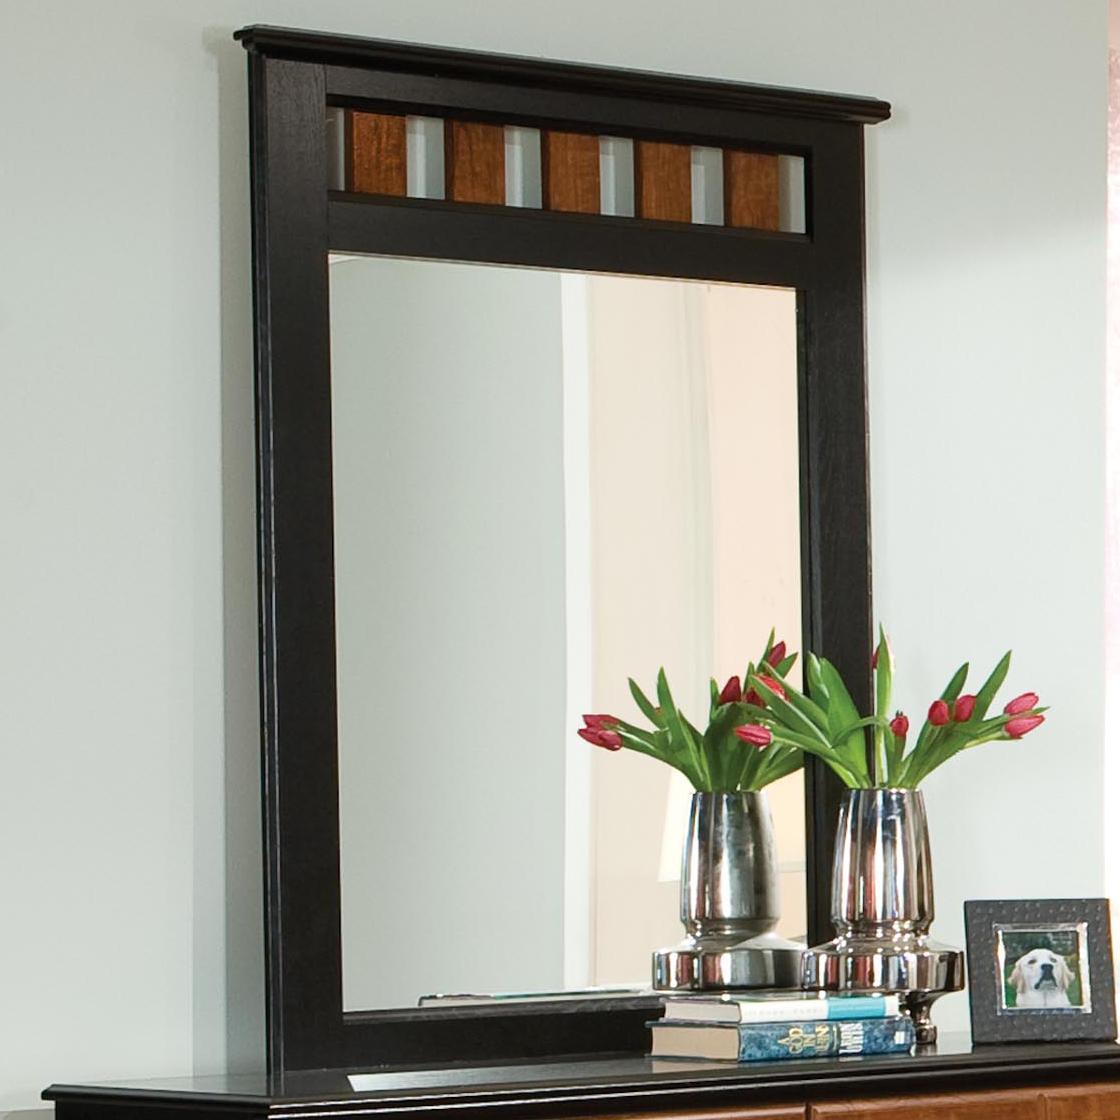 Standard Furniture Steelwood Dresser Mirror - Item Number: 61268